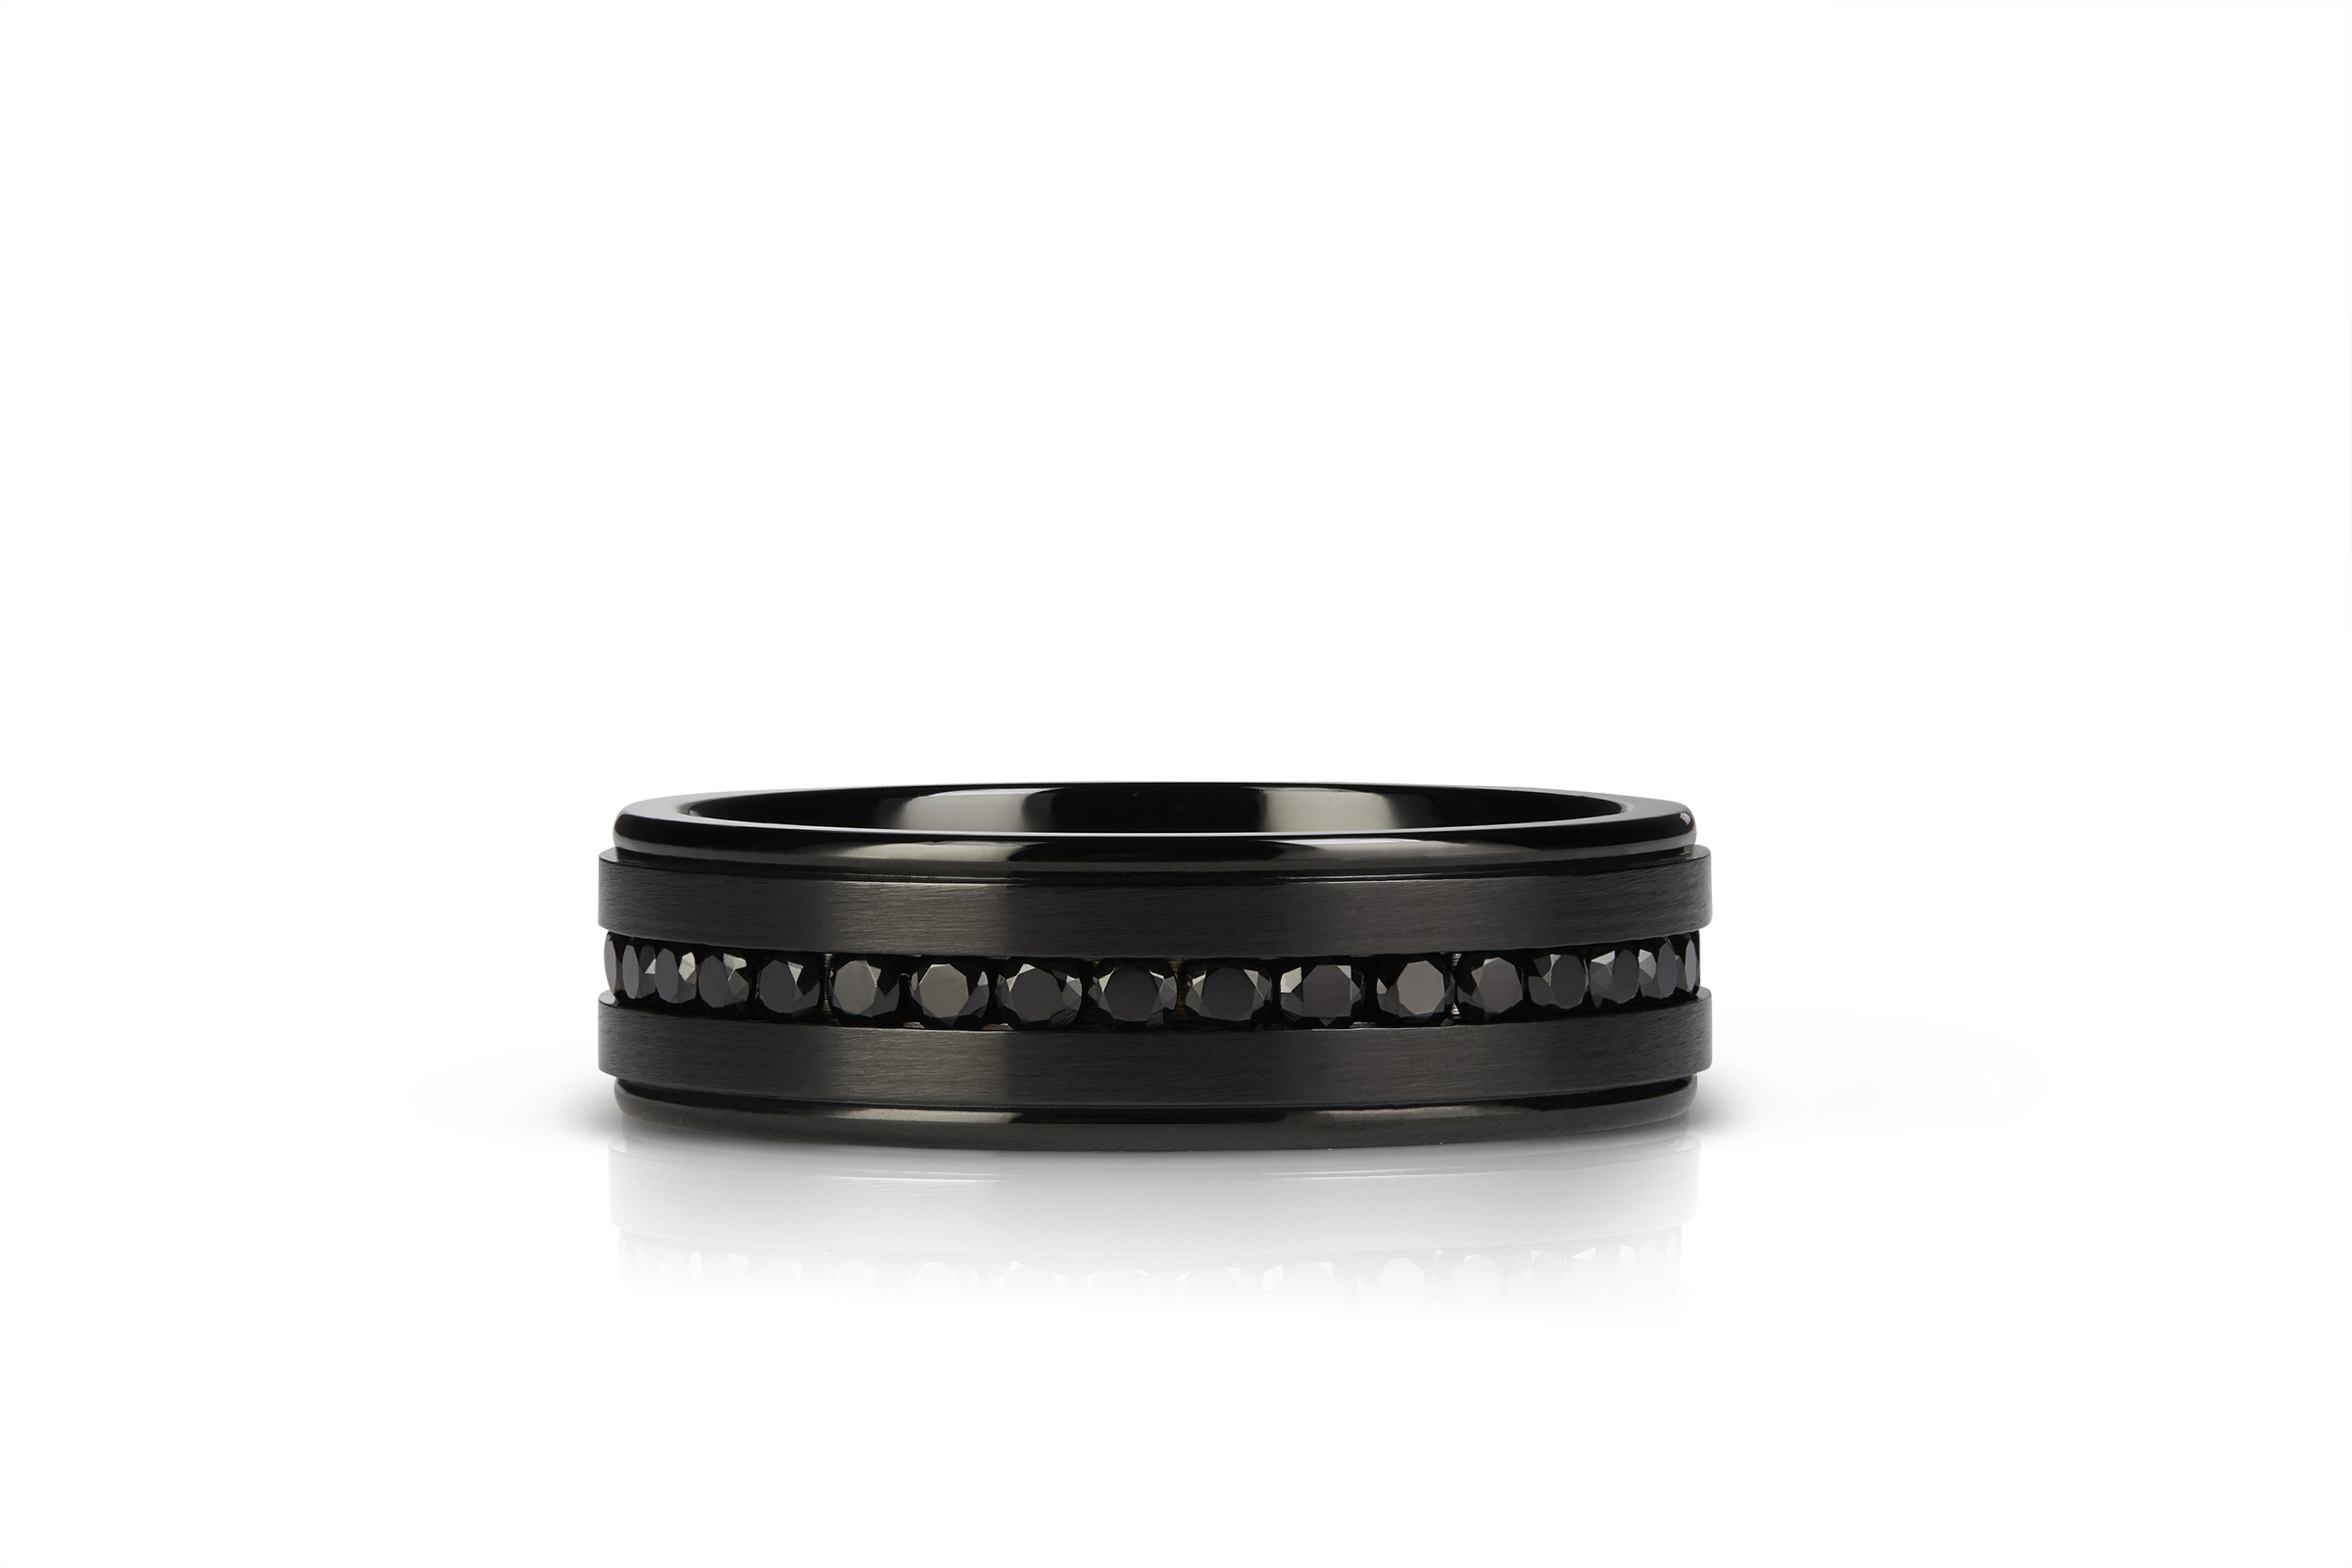 photographe-ecommerce-bijoux-bague-montreal-118